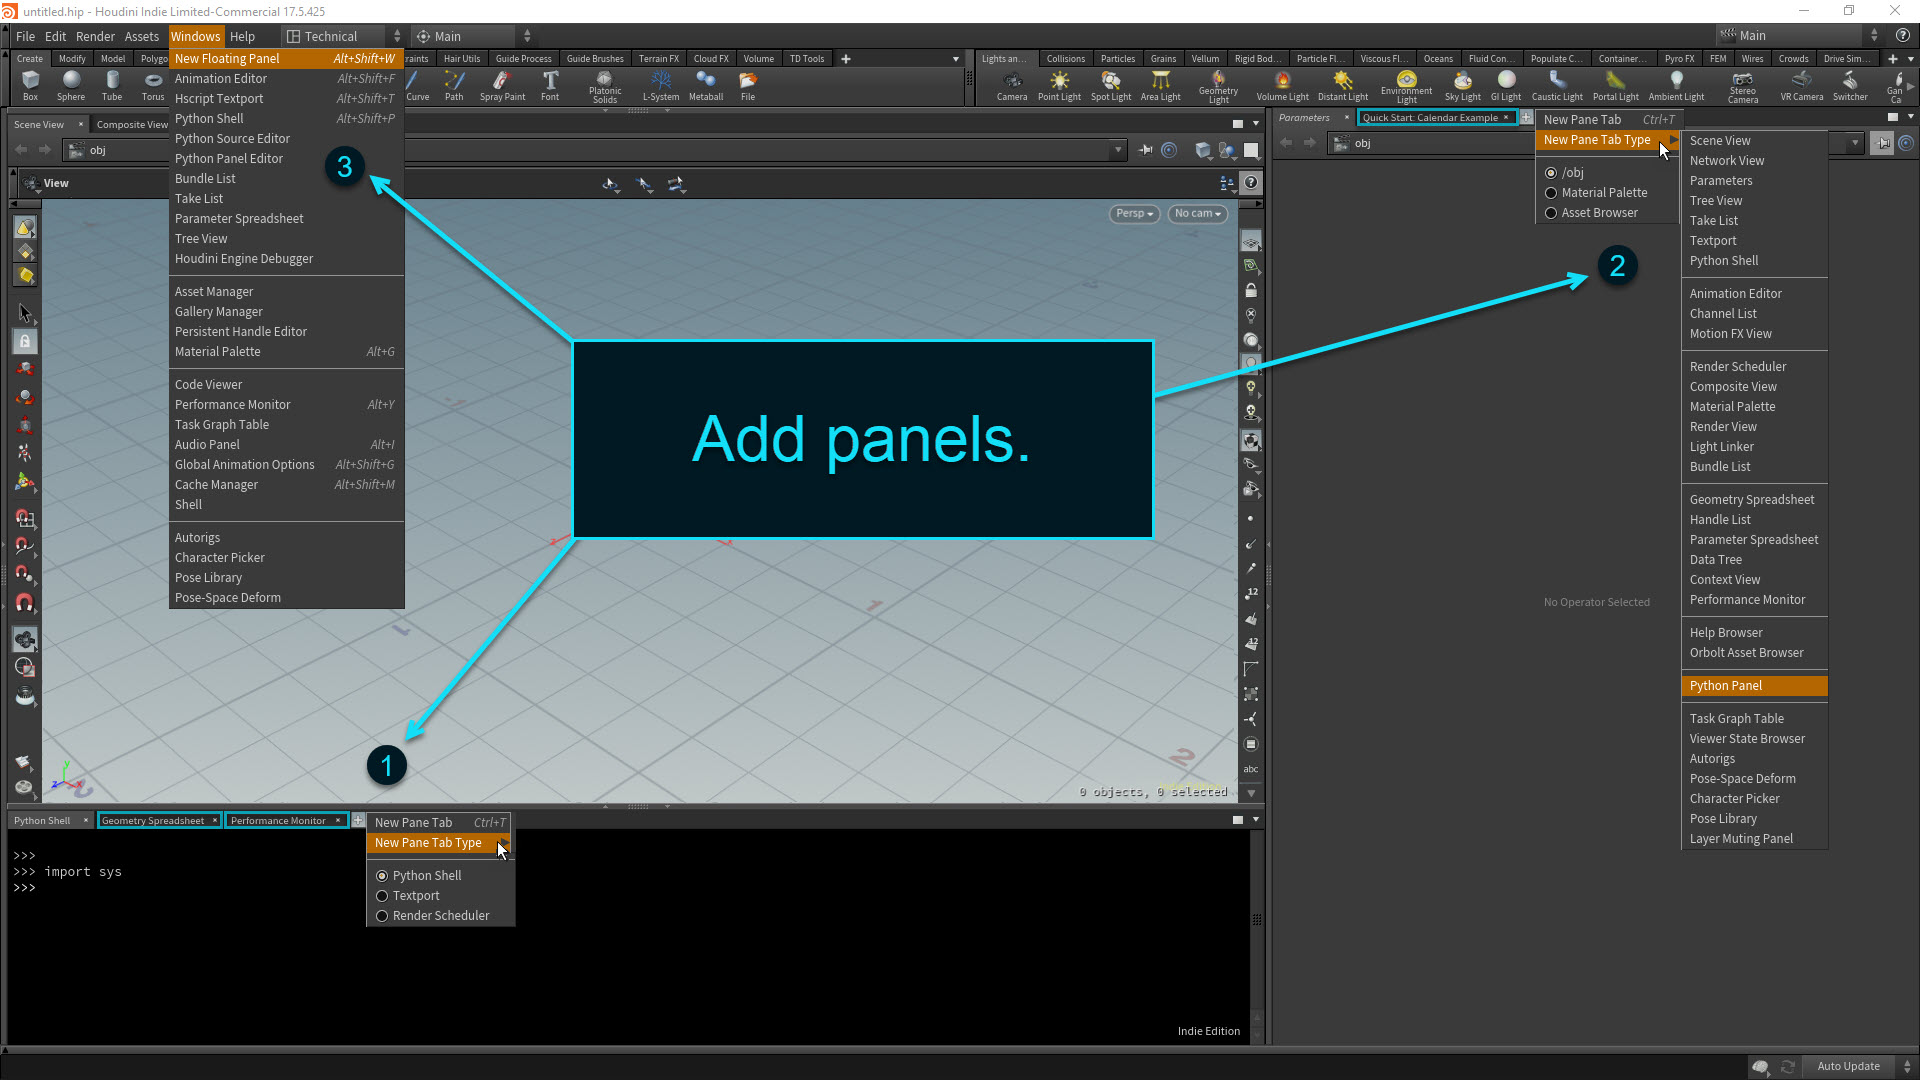 Houdini Desktop Setup - Add panels